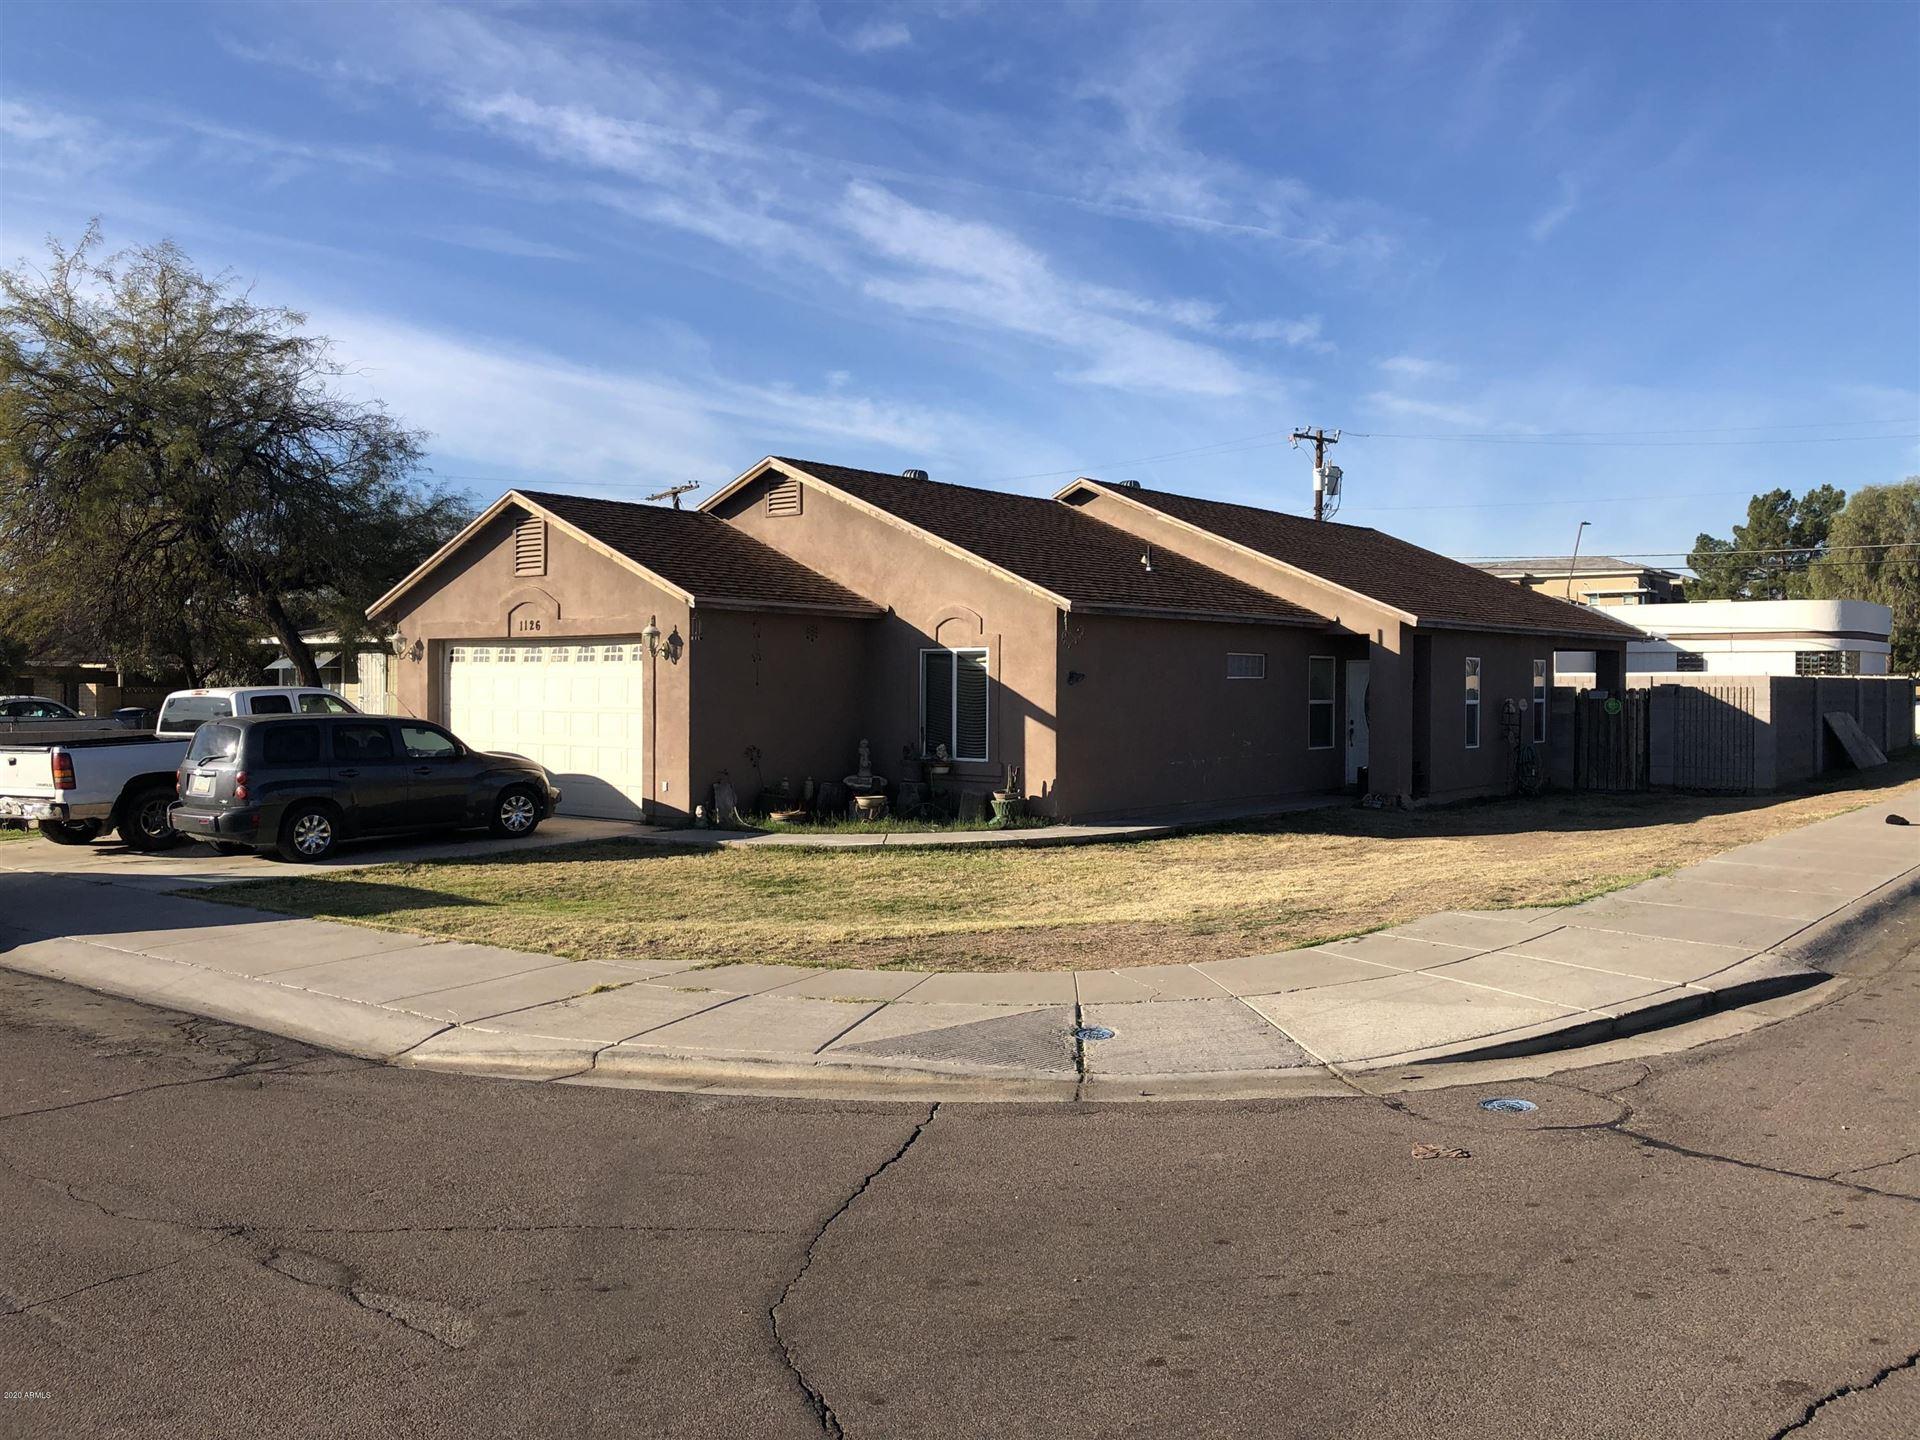 1126 N Esther Street, Tempe, AZ 85281 - MLS#: 6025408